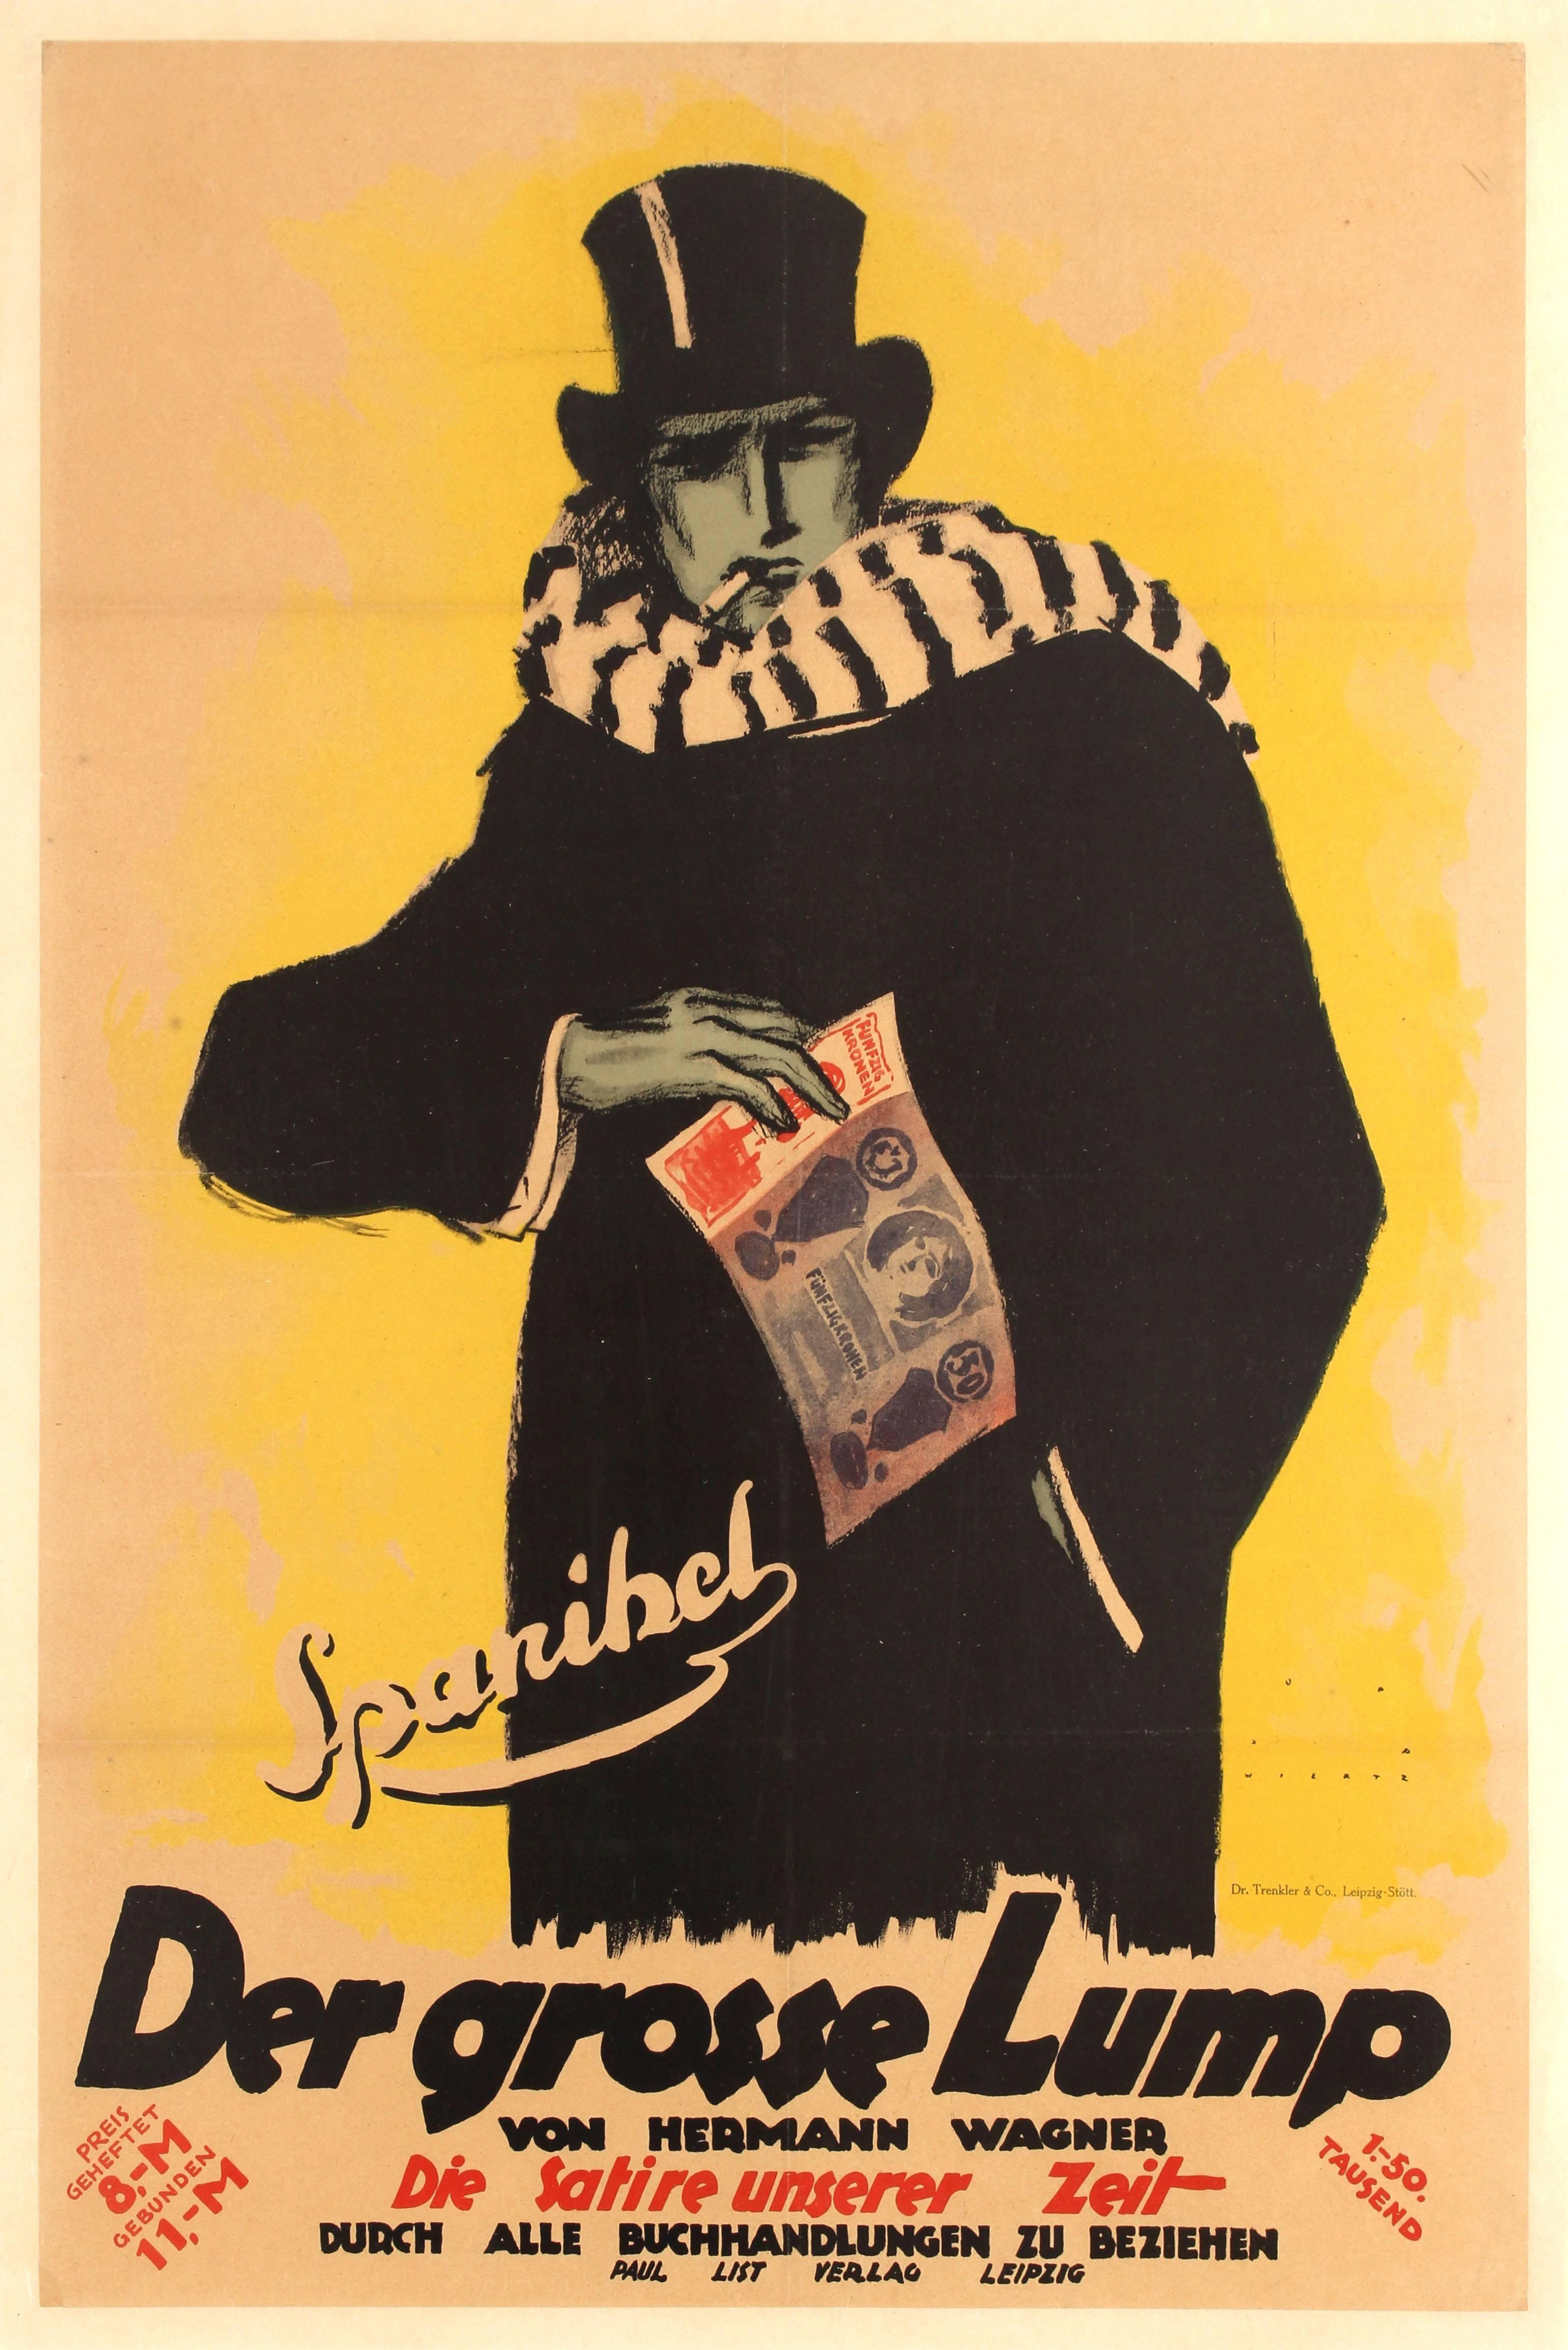 Original Vintage German Book Advertising Poster For Spanihel The Big Lump Satire